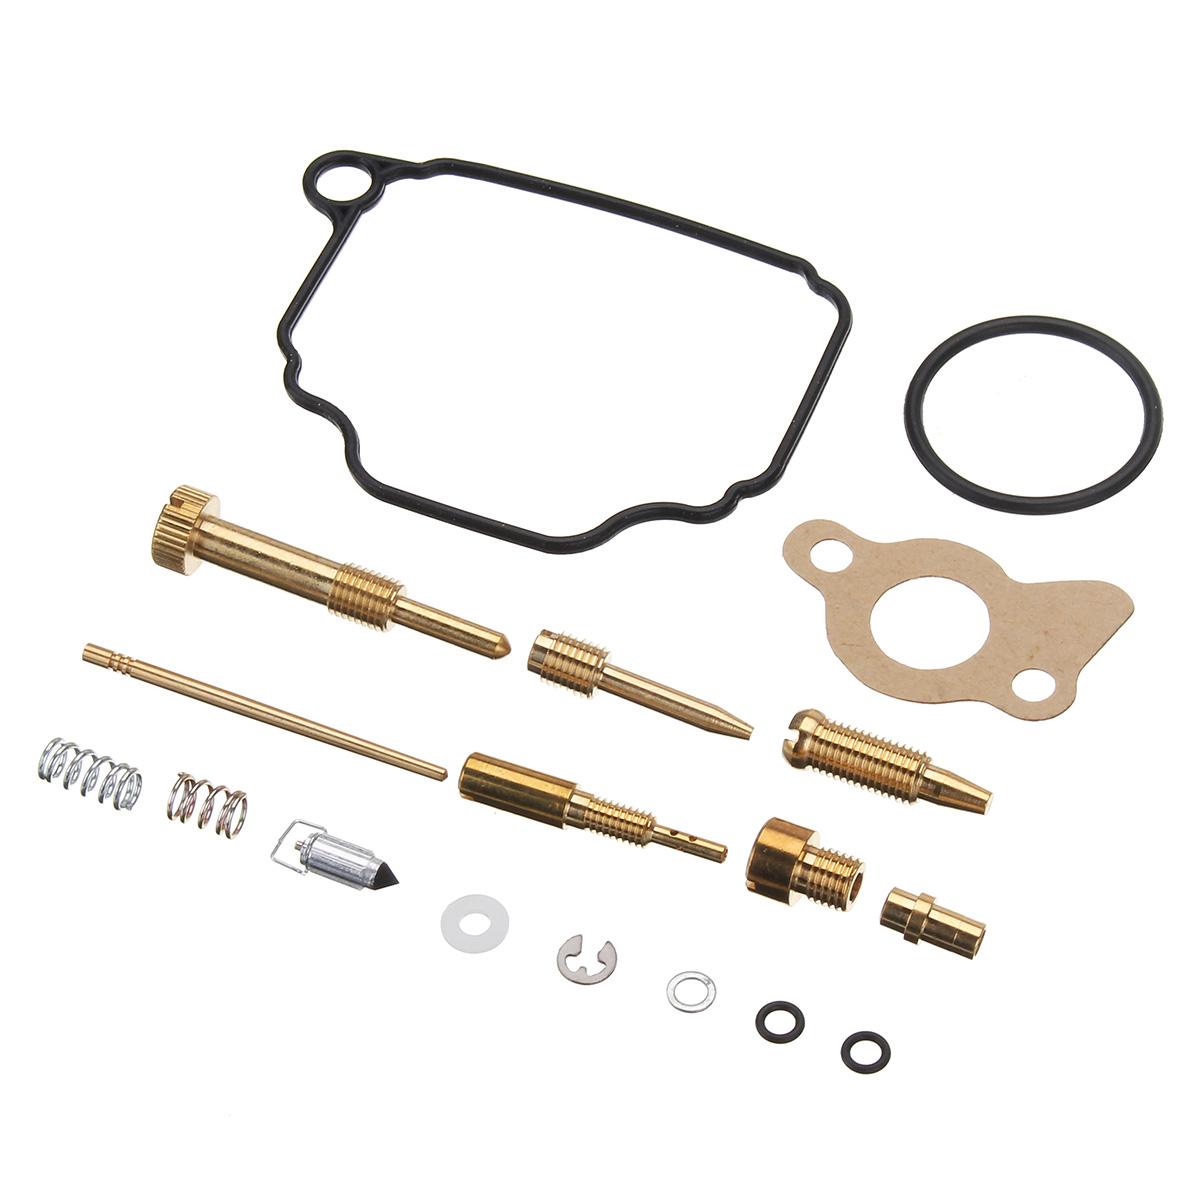 Yamaha Tt Carburetor Rebuild Kit